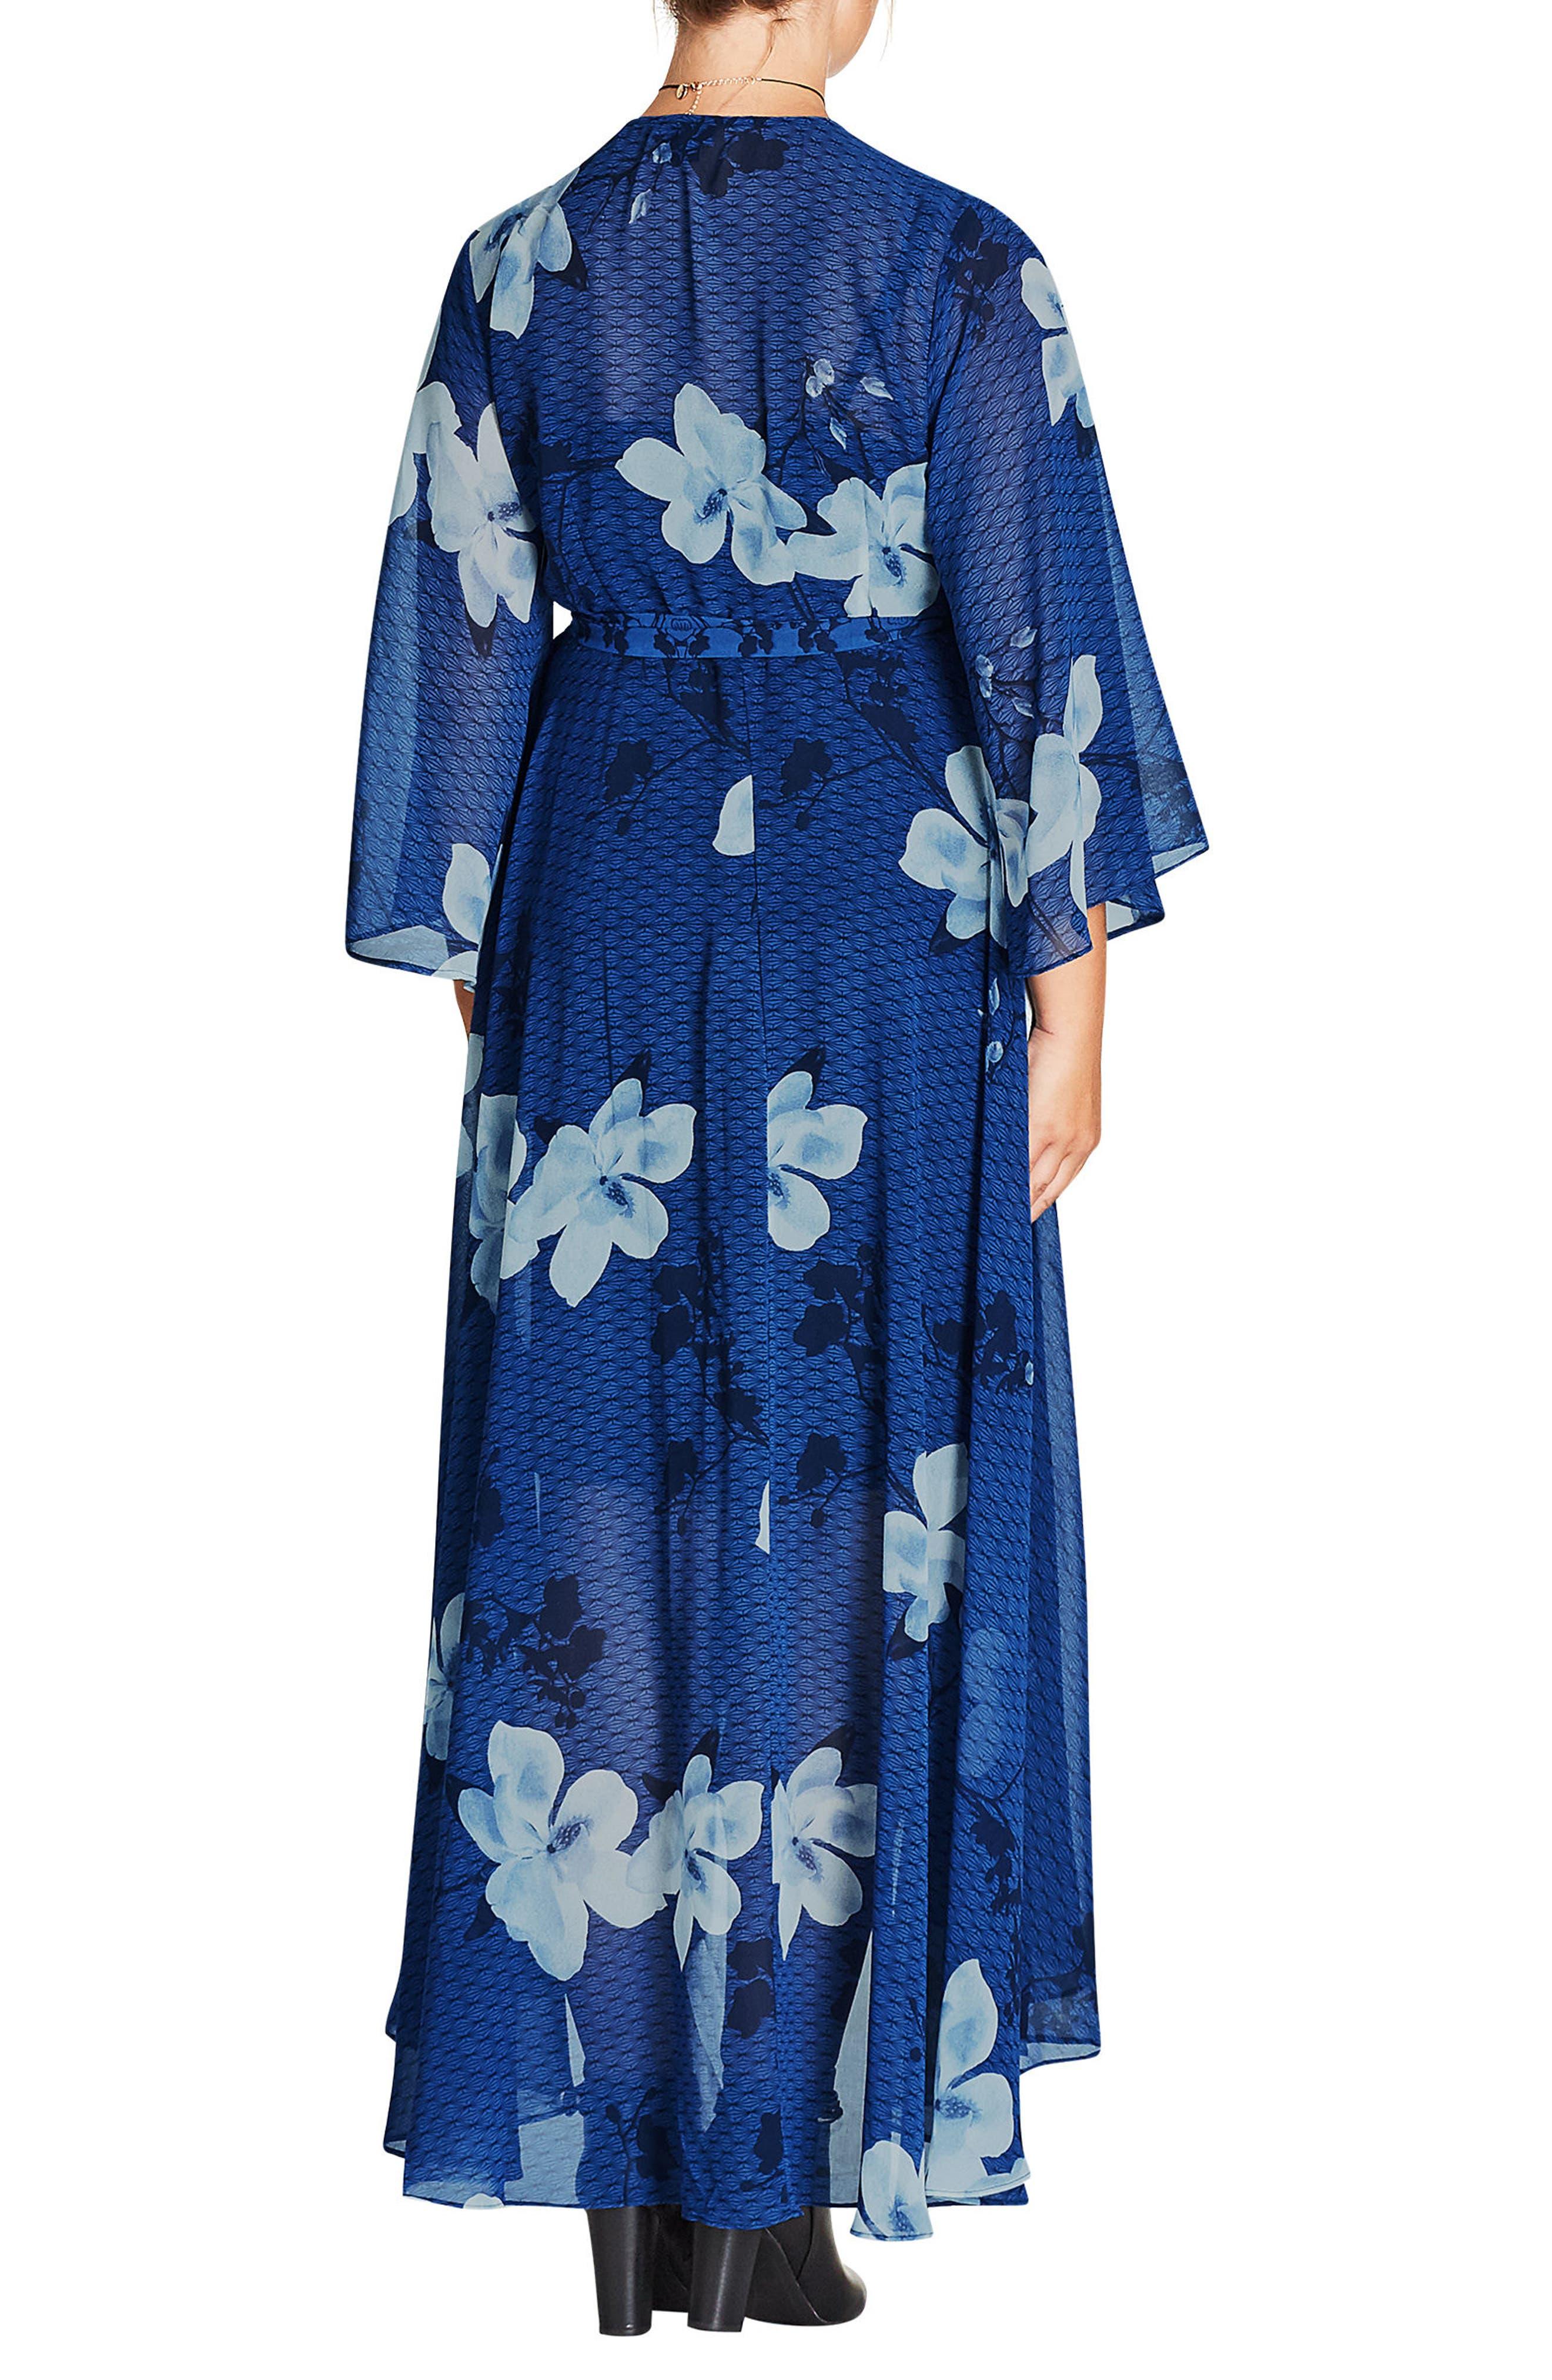 Blue Magnolia Maxi Wrap Dress,                             Alternate thumbnail 2, color,                             Blue Magnolia